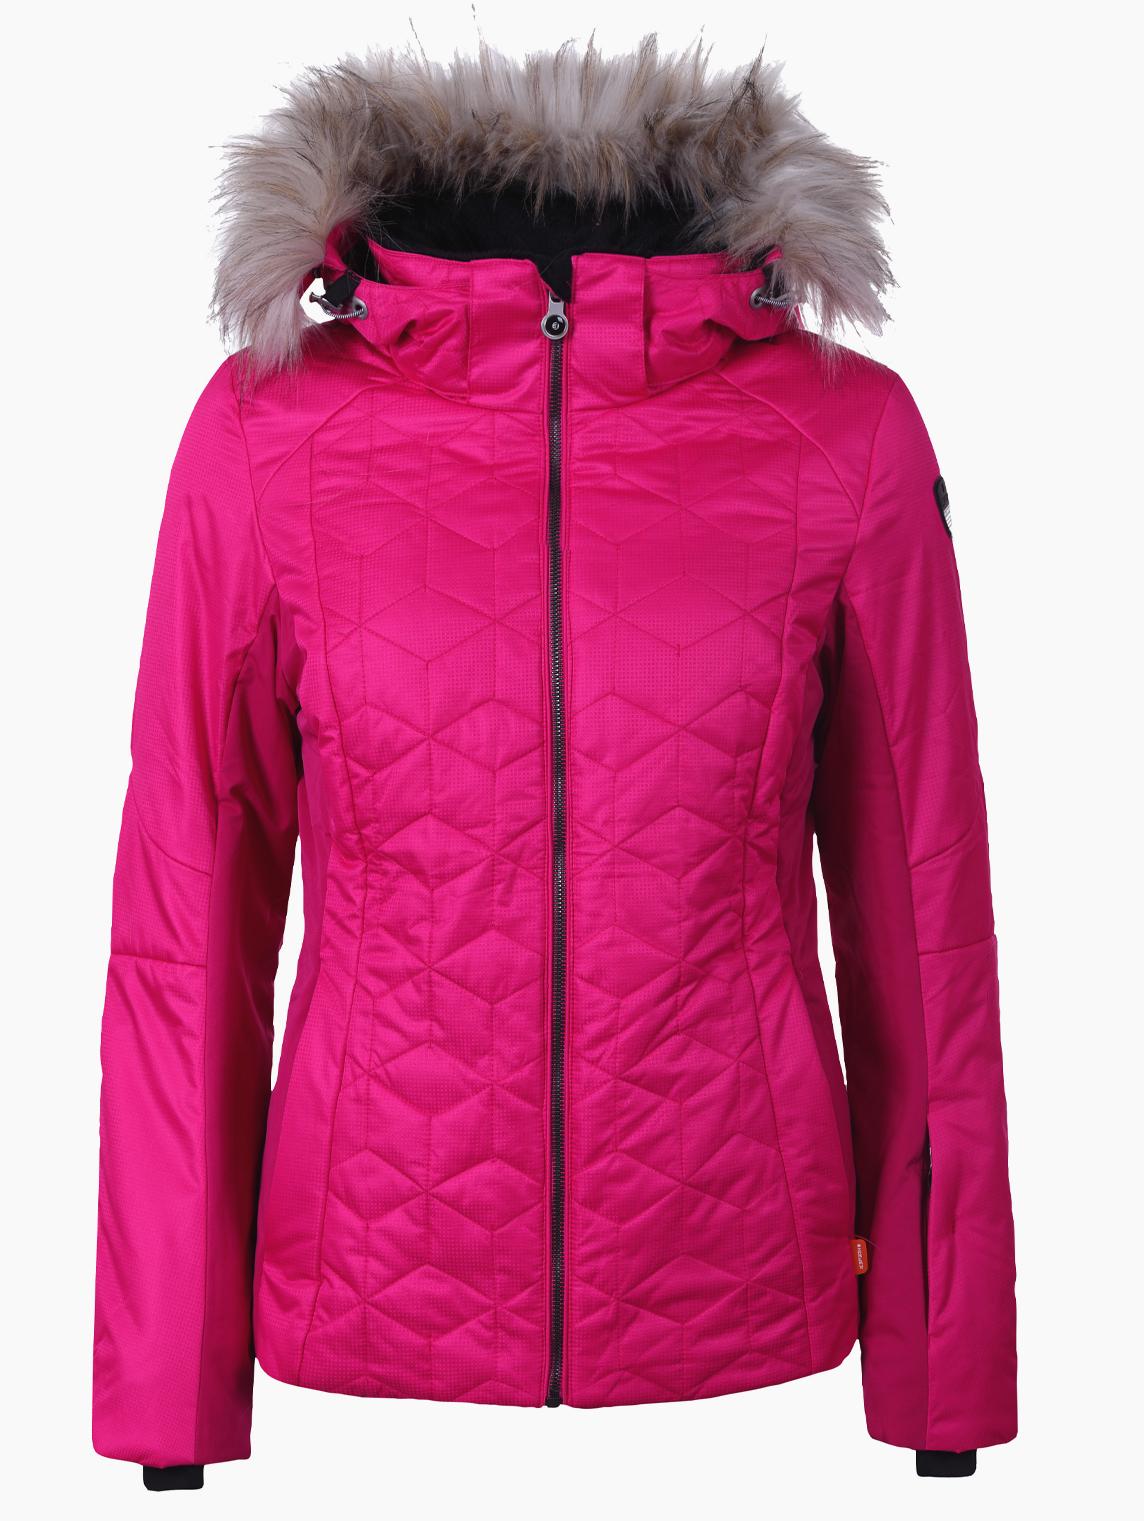 Dámska zimná bunda Icepeak Claudia ružová col. 635 cdfb409de5a